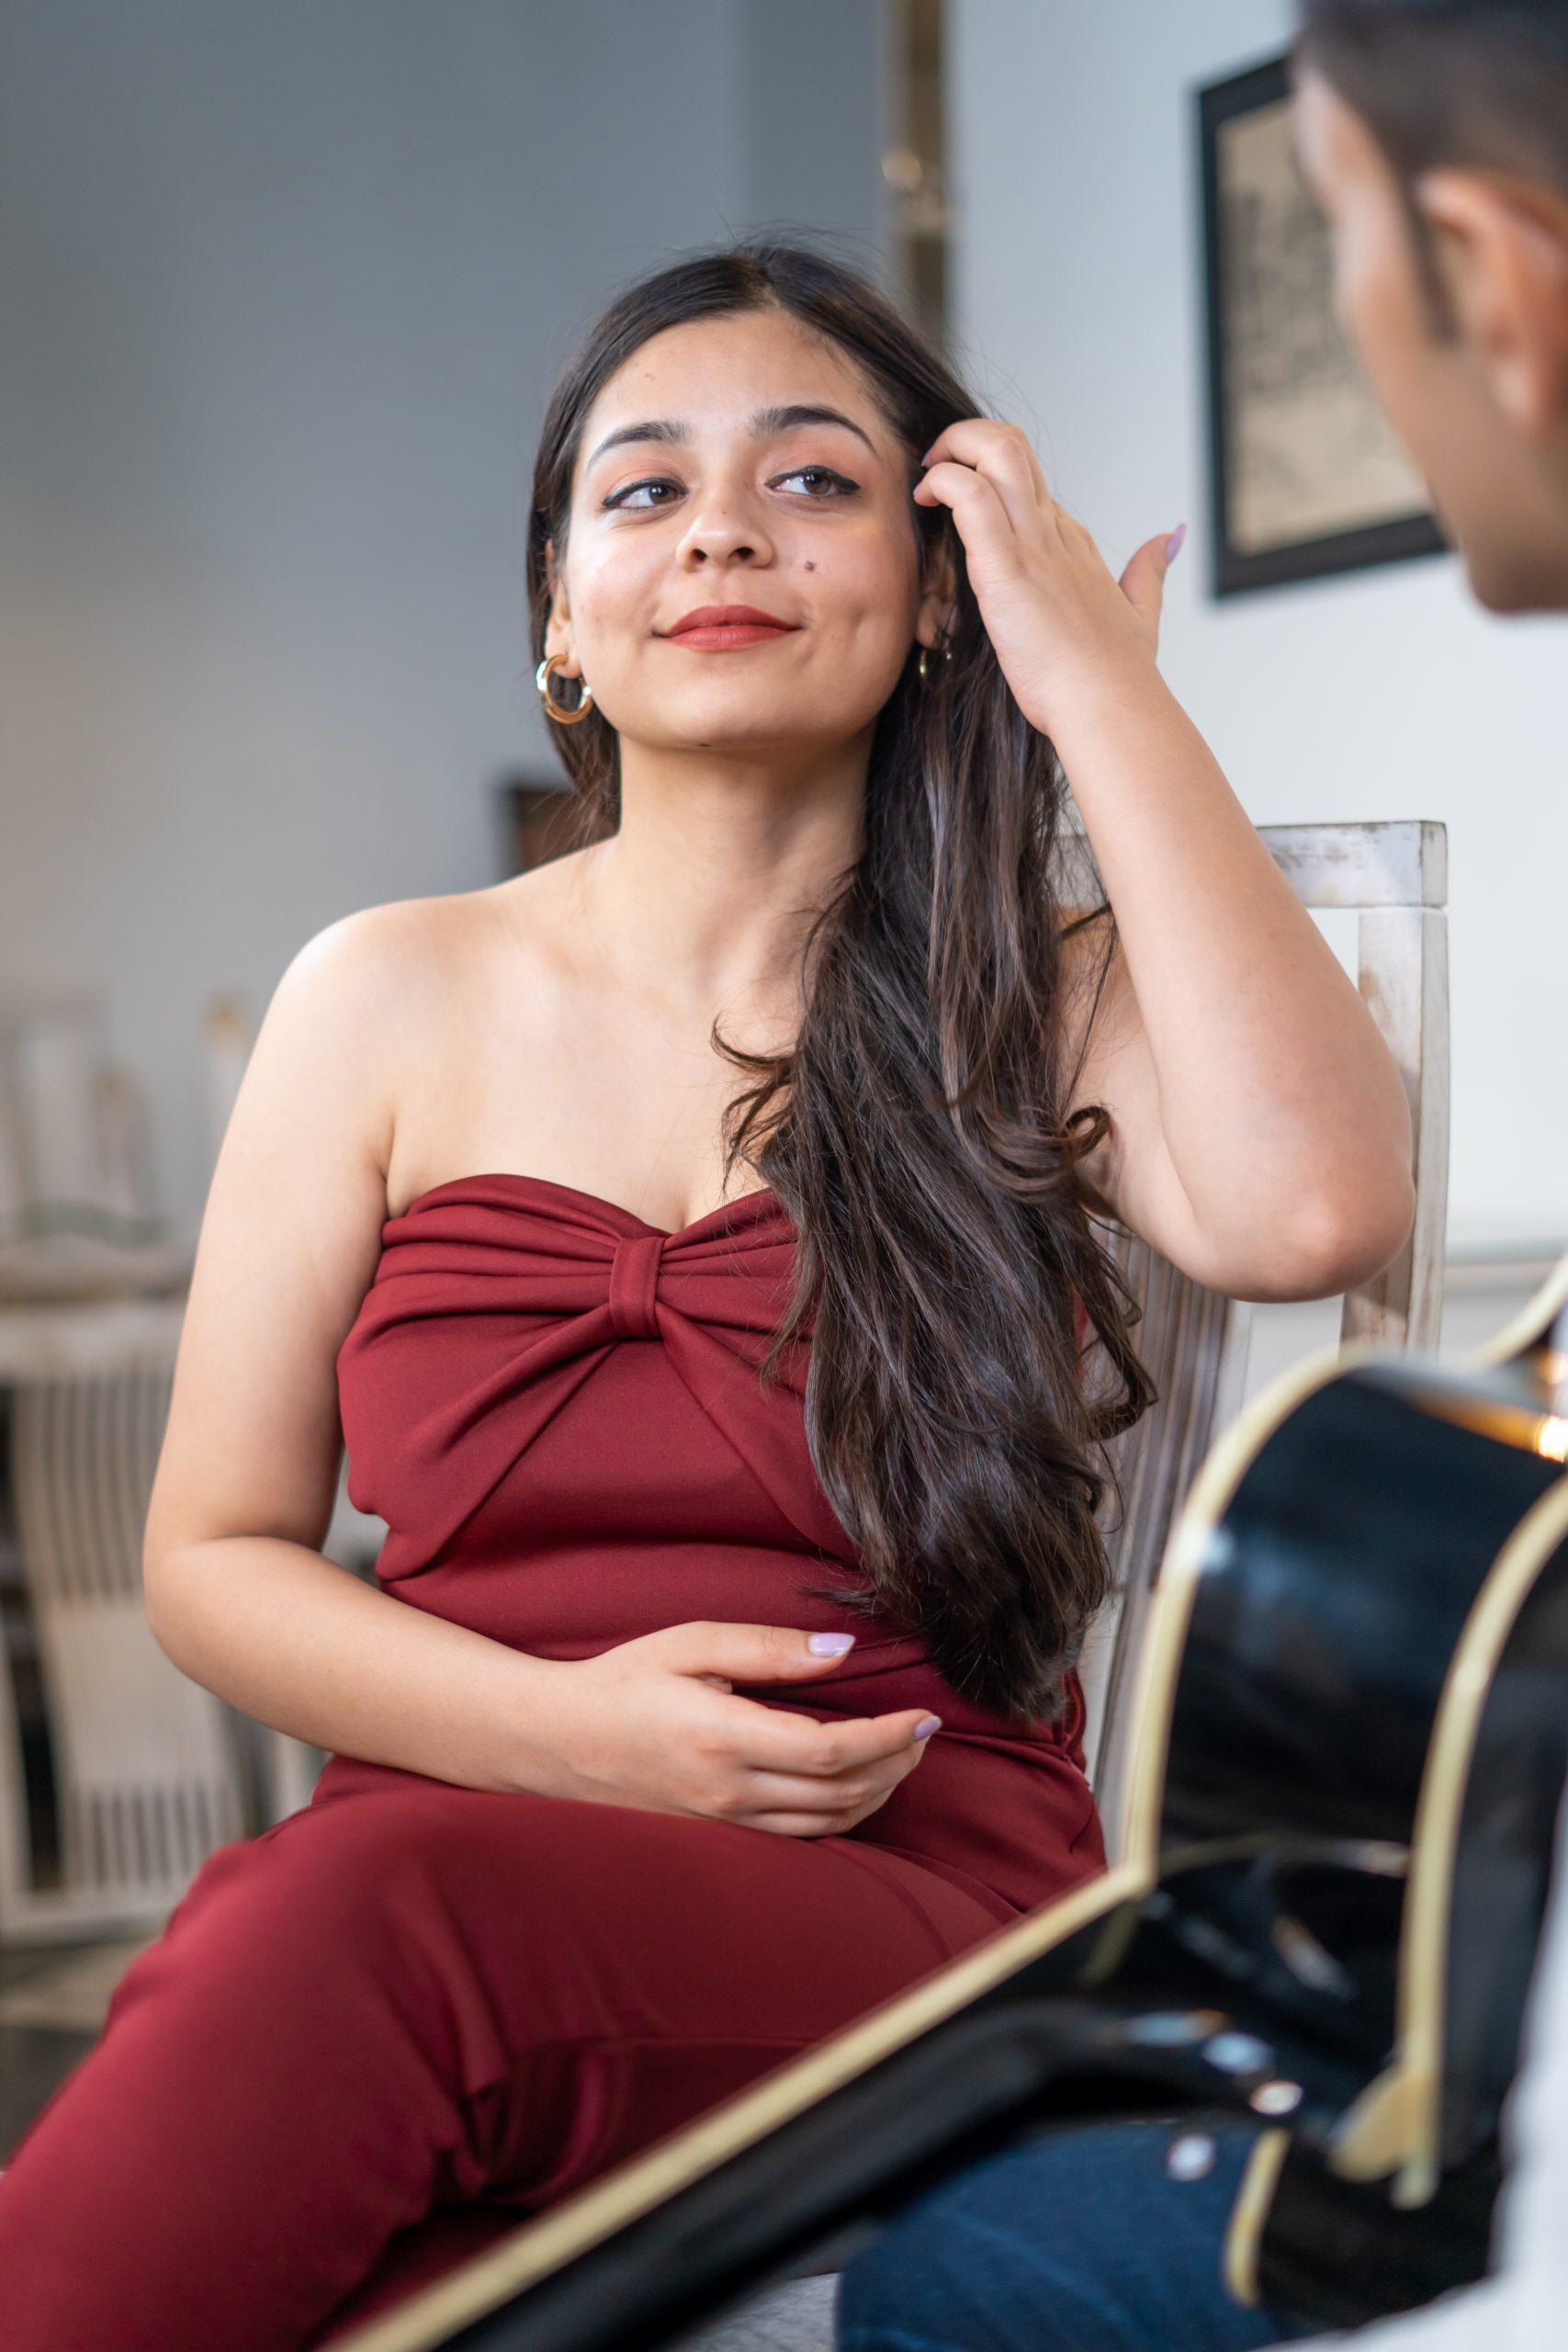 Girl listening to guitar played by boyfriend